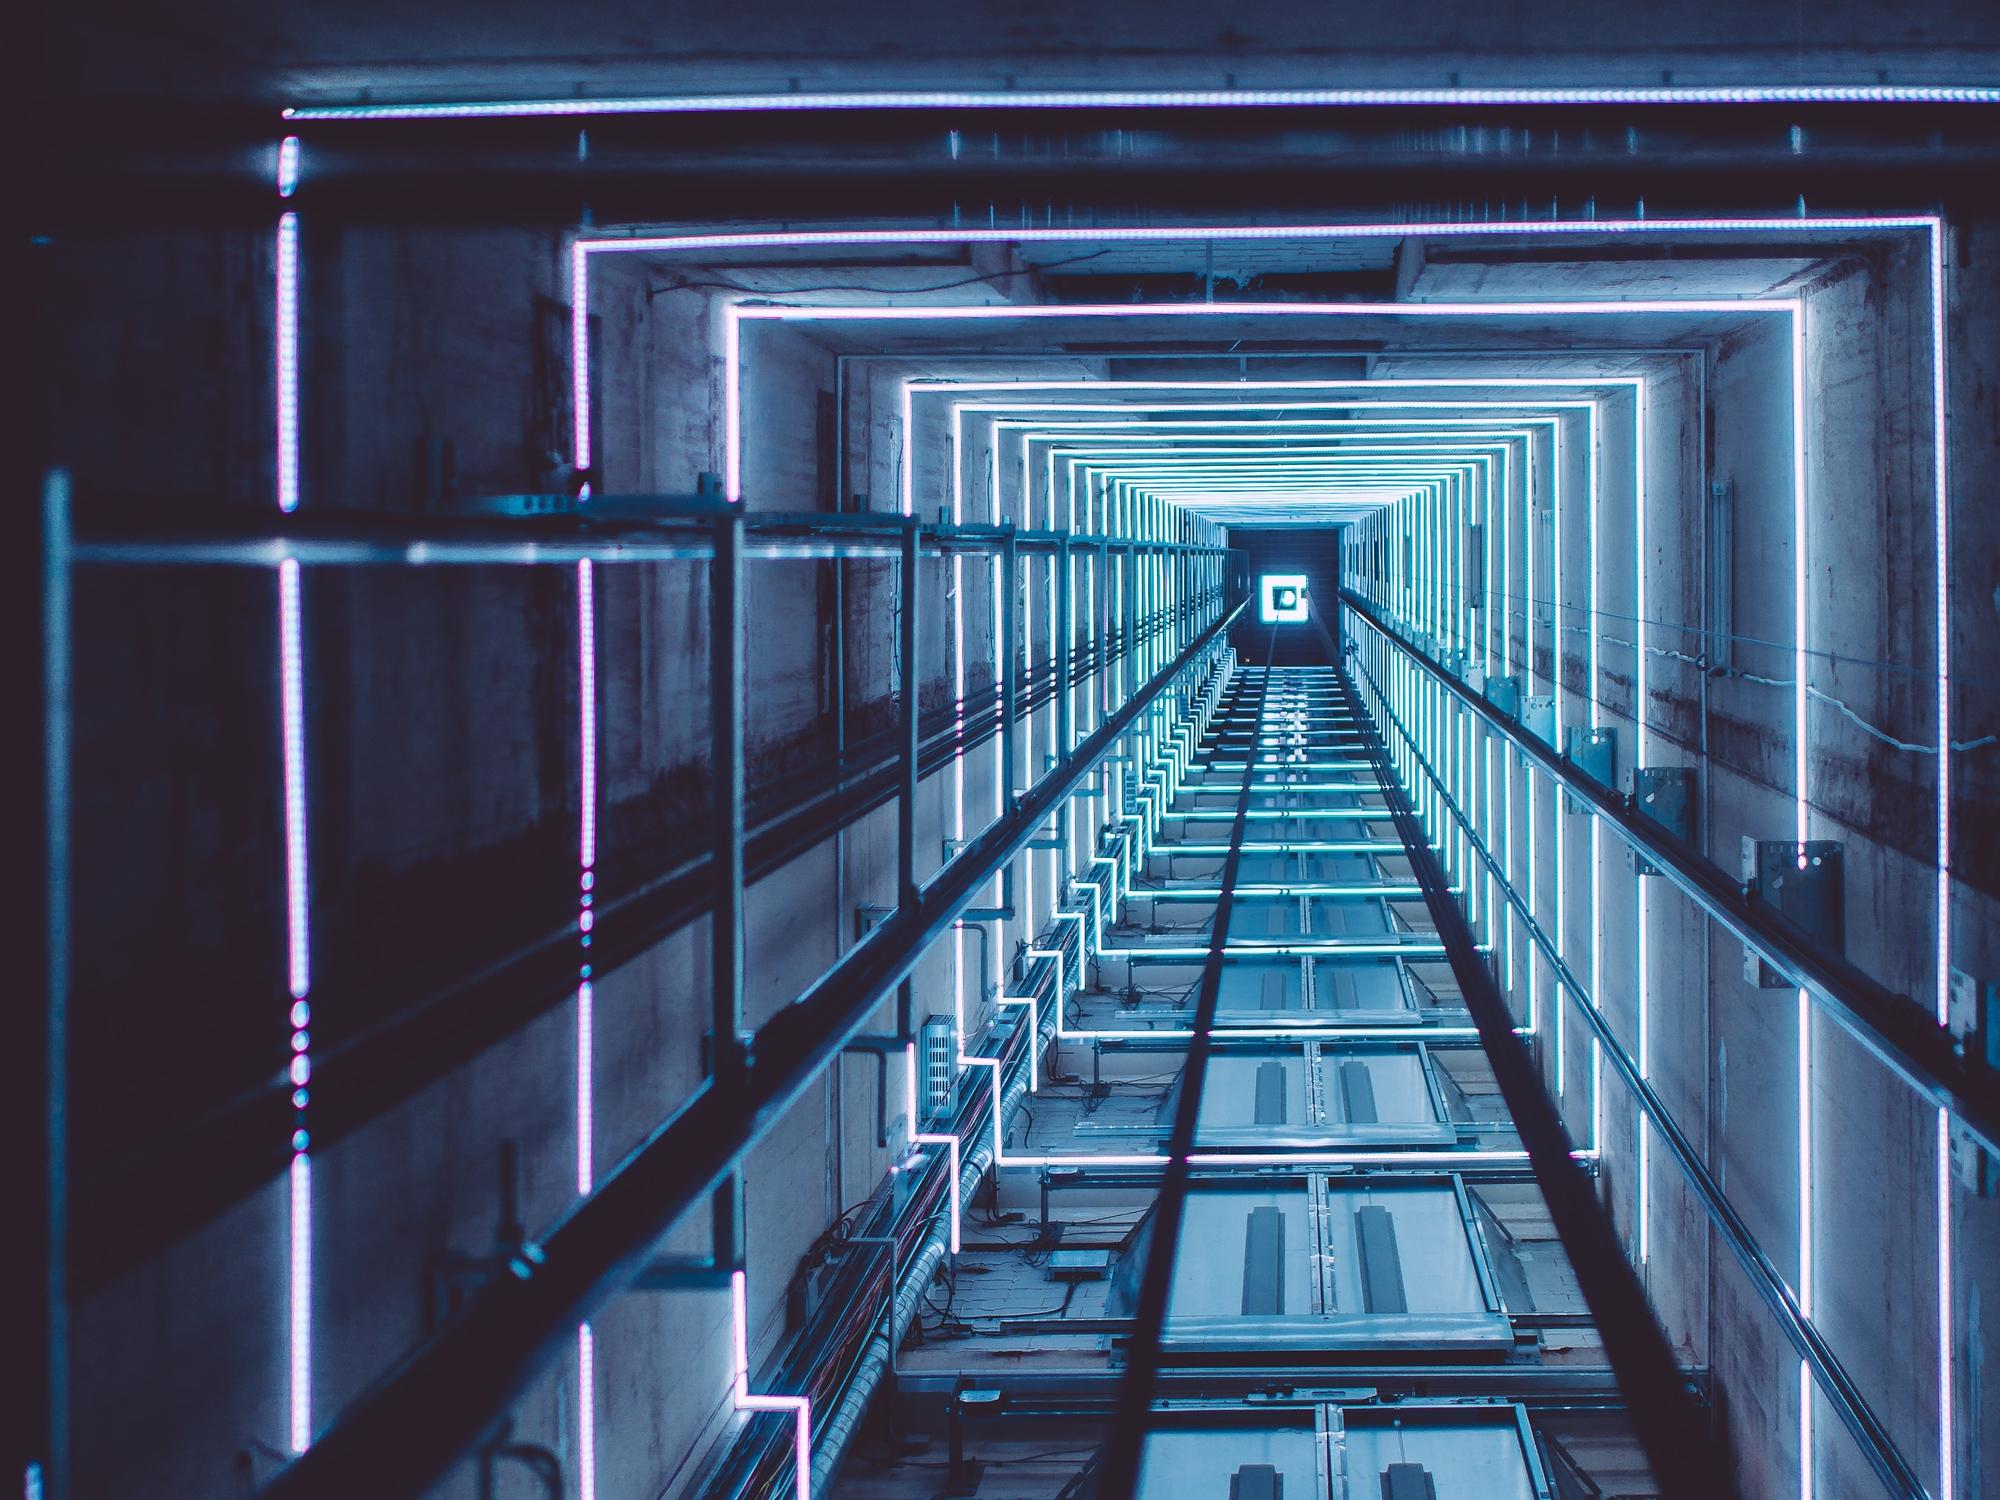 نصب آسانسور در کرج، قدم اول آهن کشی و شاقول ریزی